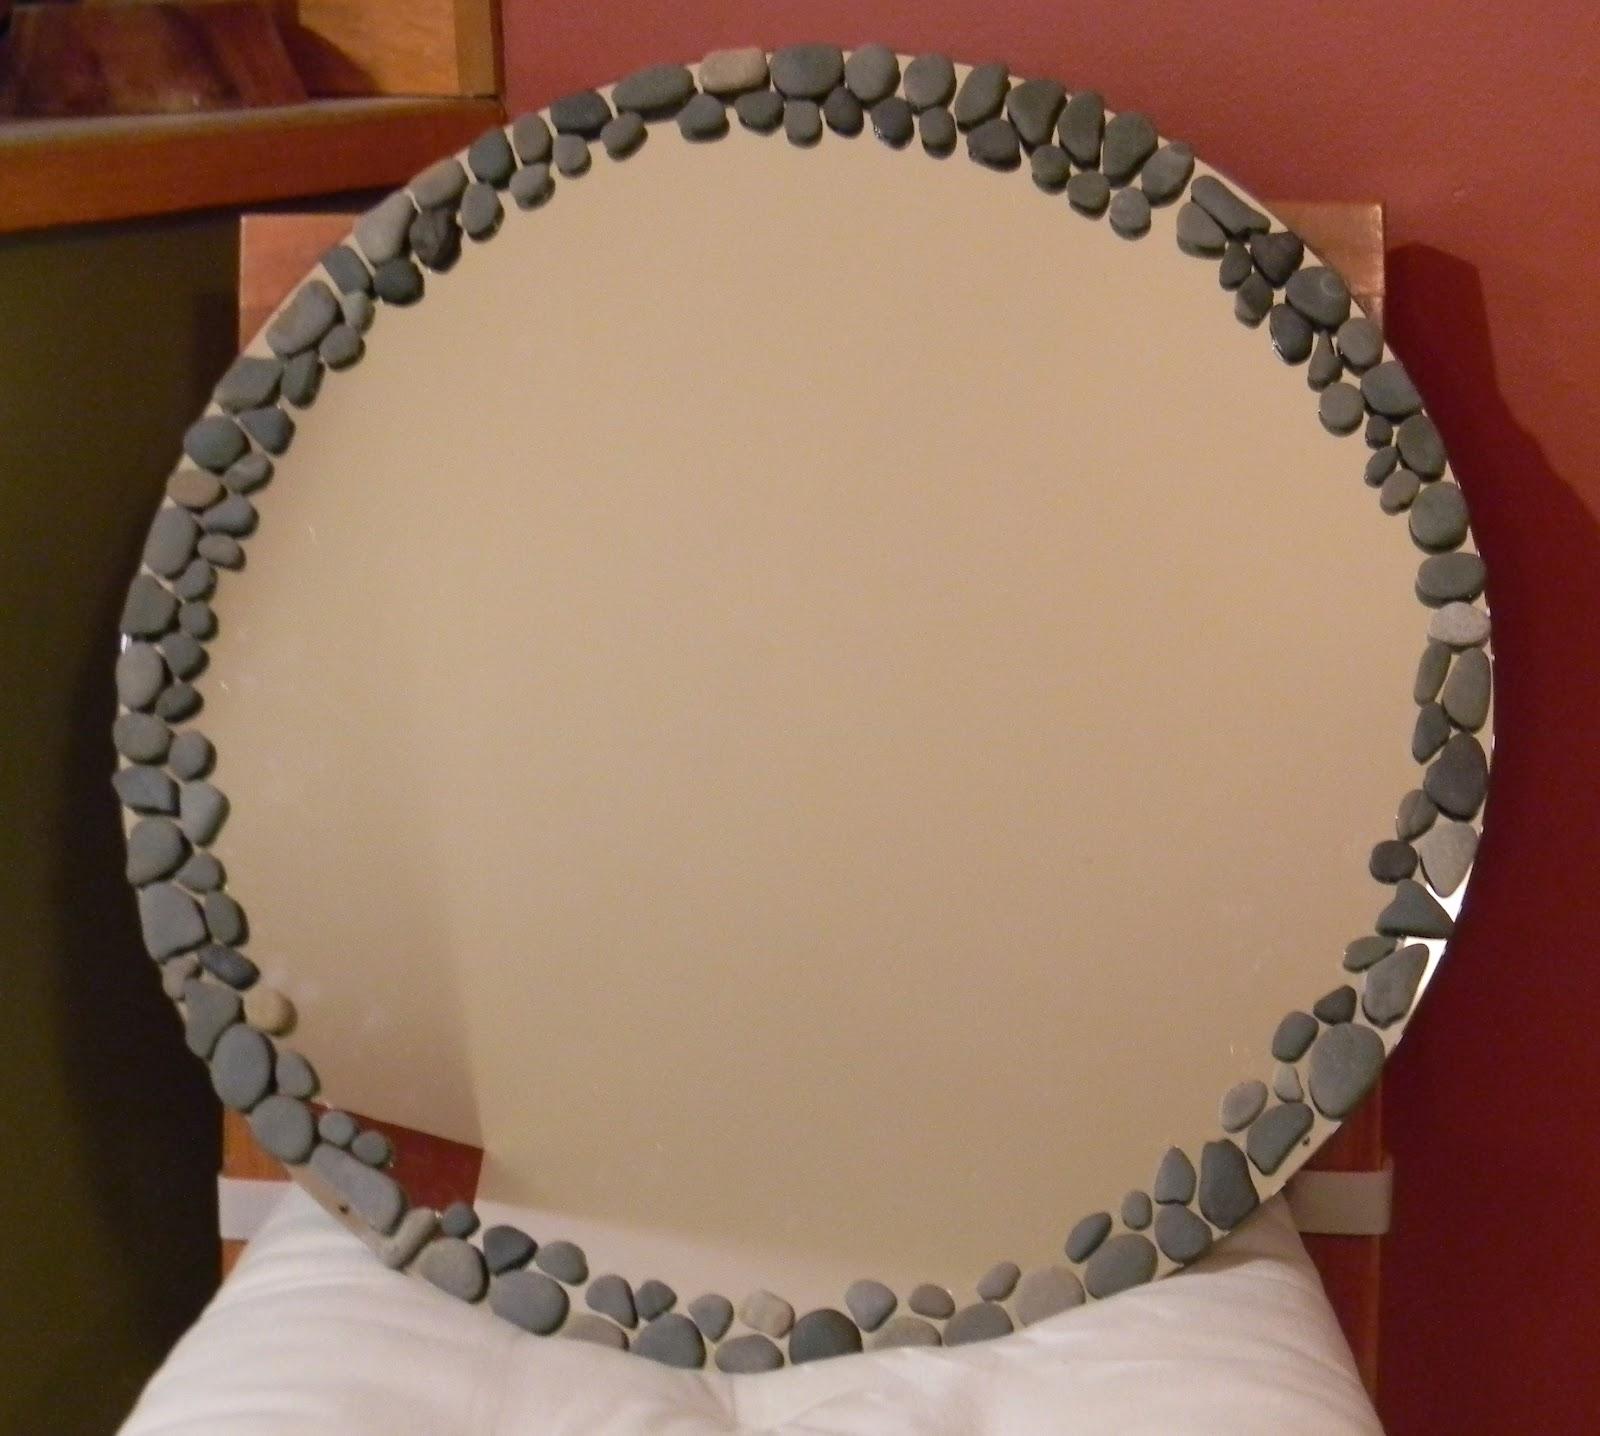 How to make a decorative mirror - Using Beach Pebbles To Create A Diy Decorative Mirror